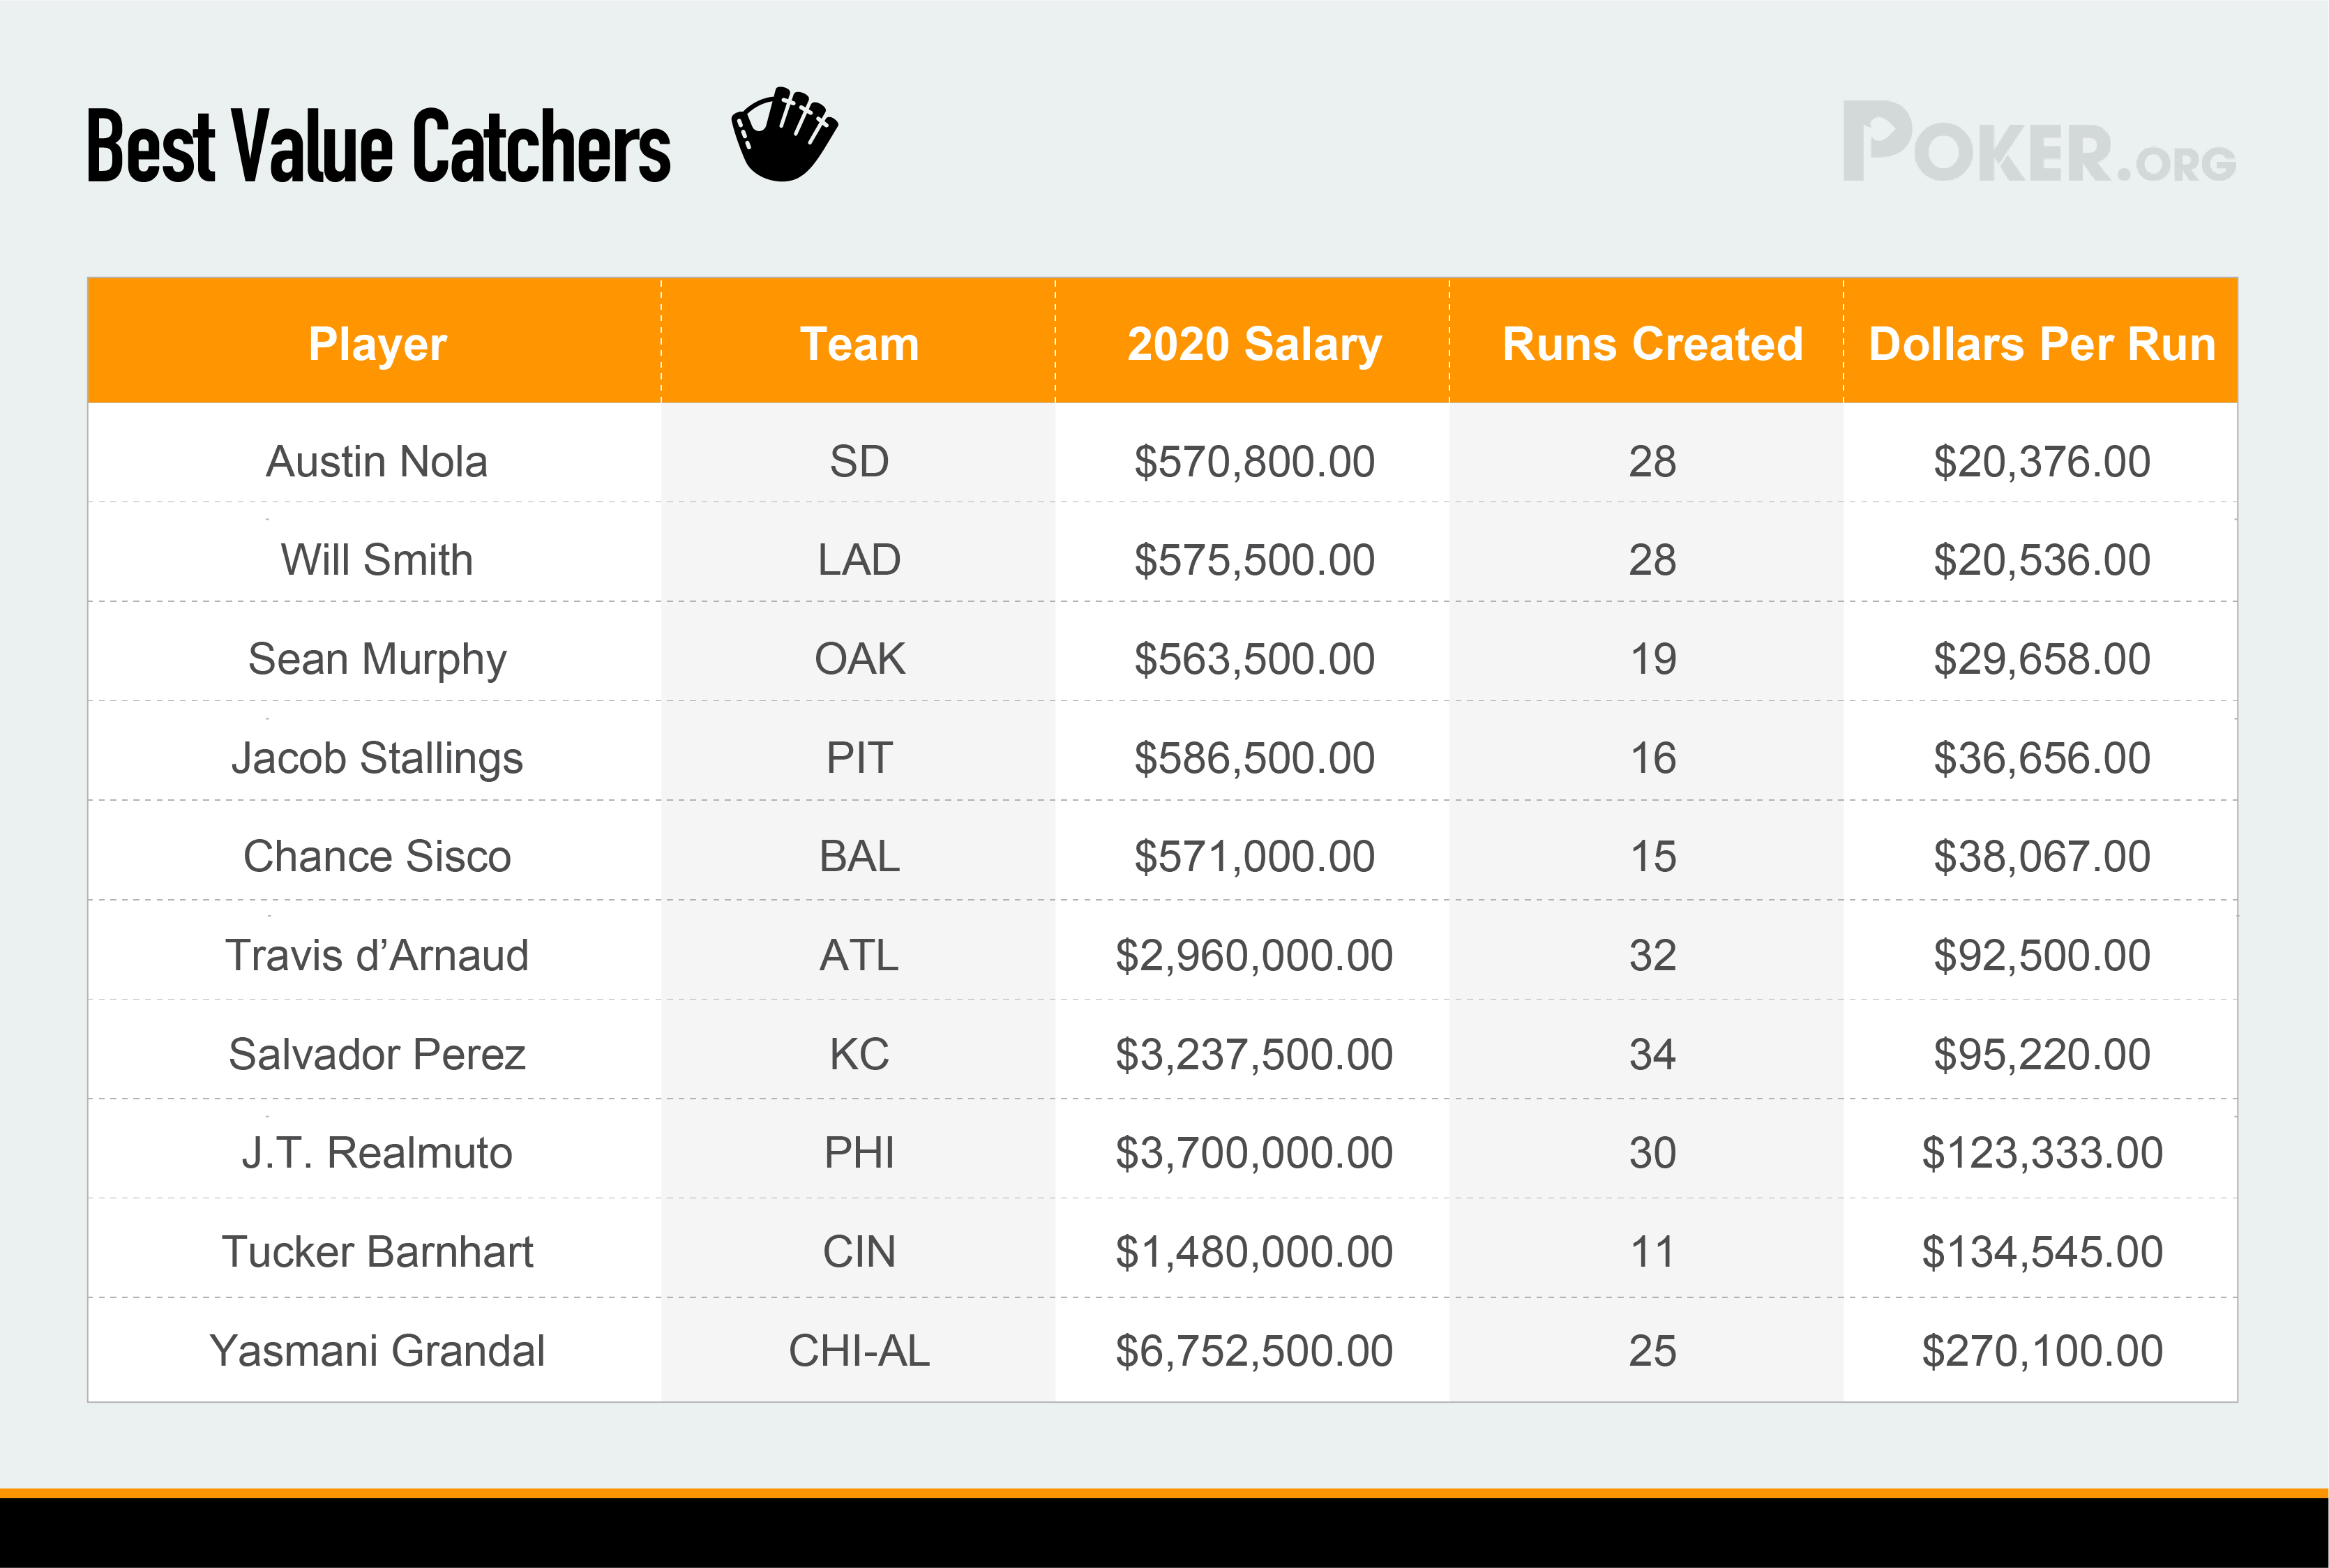 Best value catchers in baseball 2020